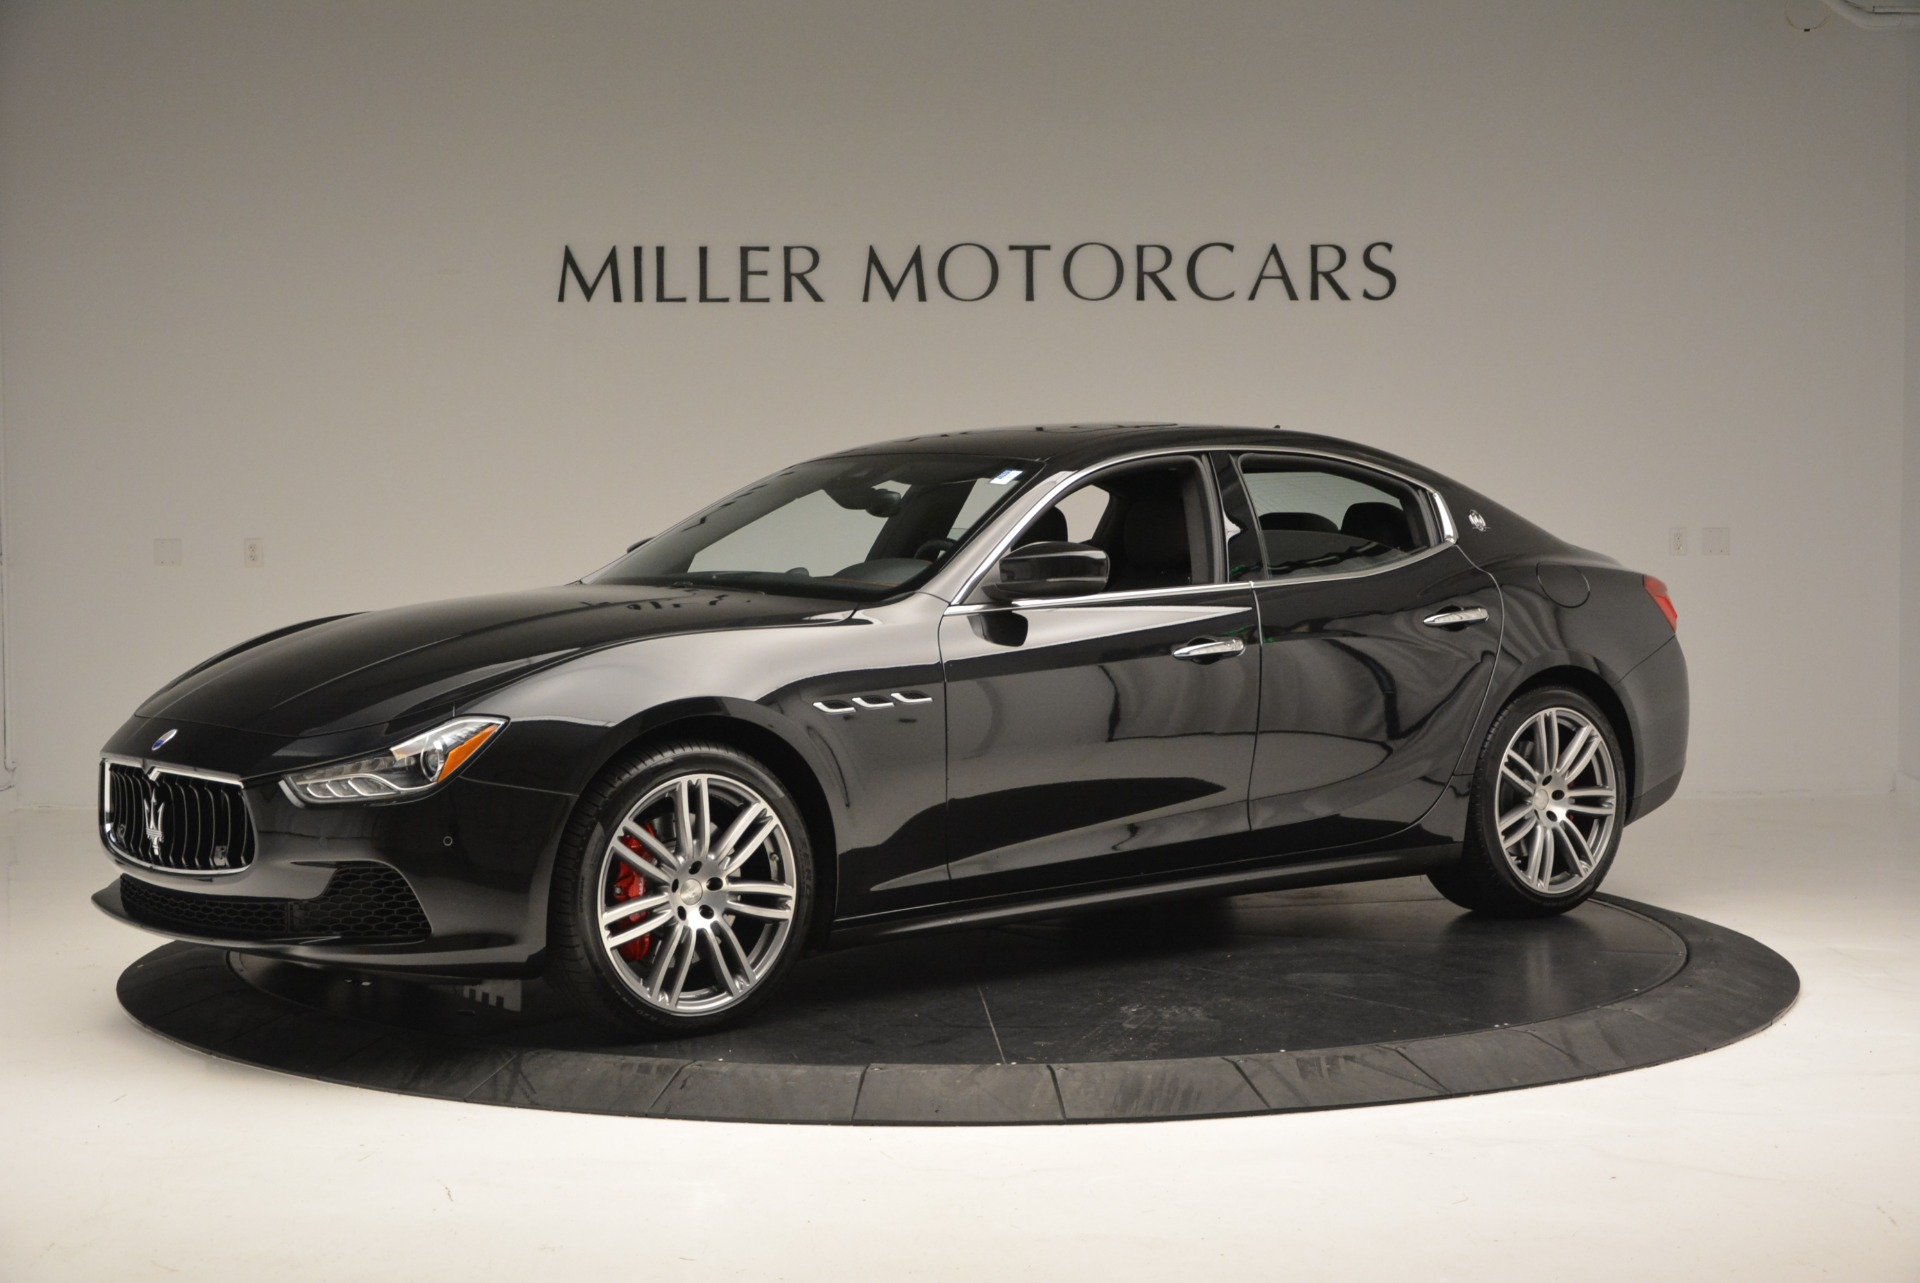 New 2017 Maserati Ghibli S Q4 For Sale In Westport, CT 604_p2